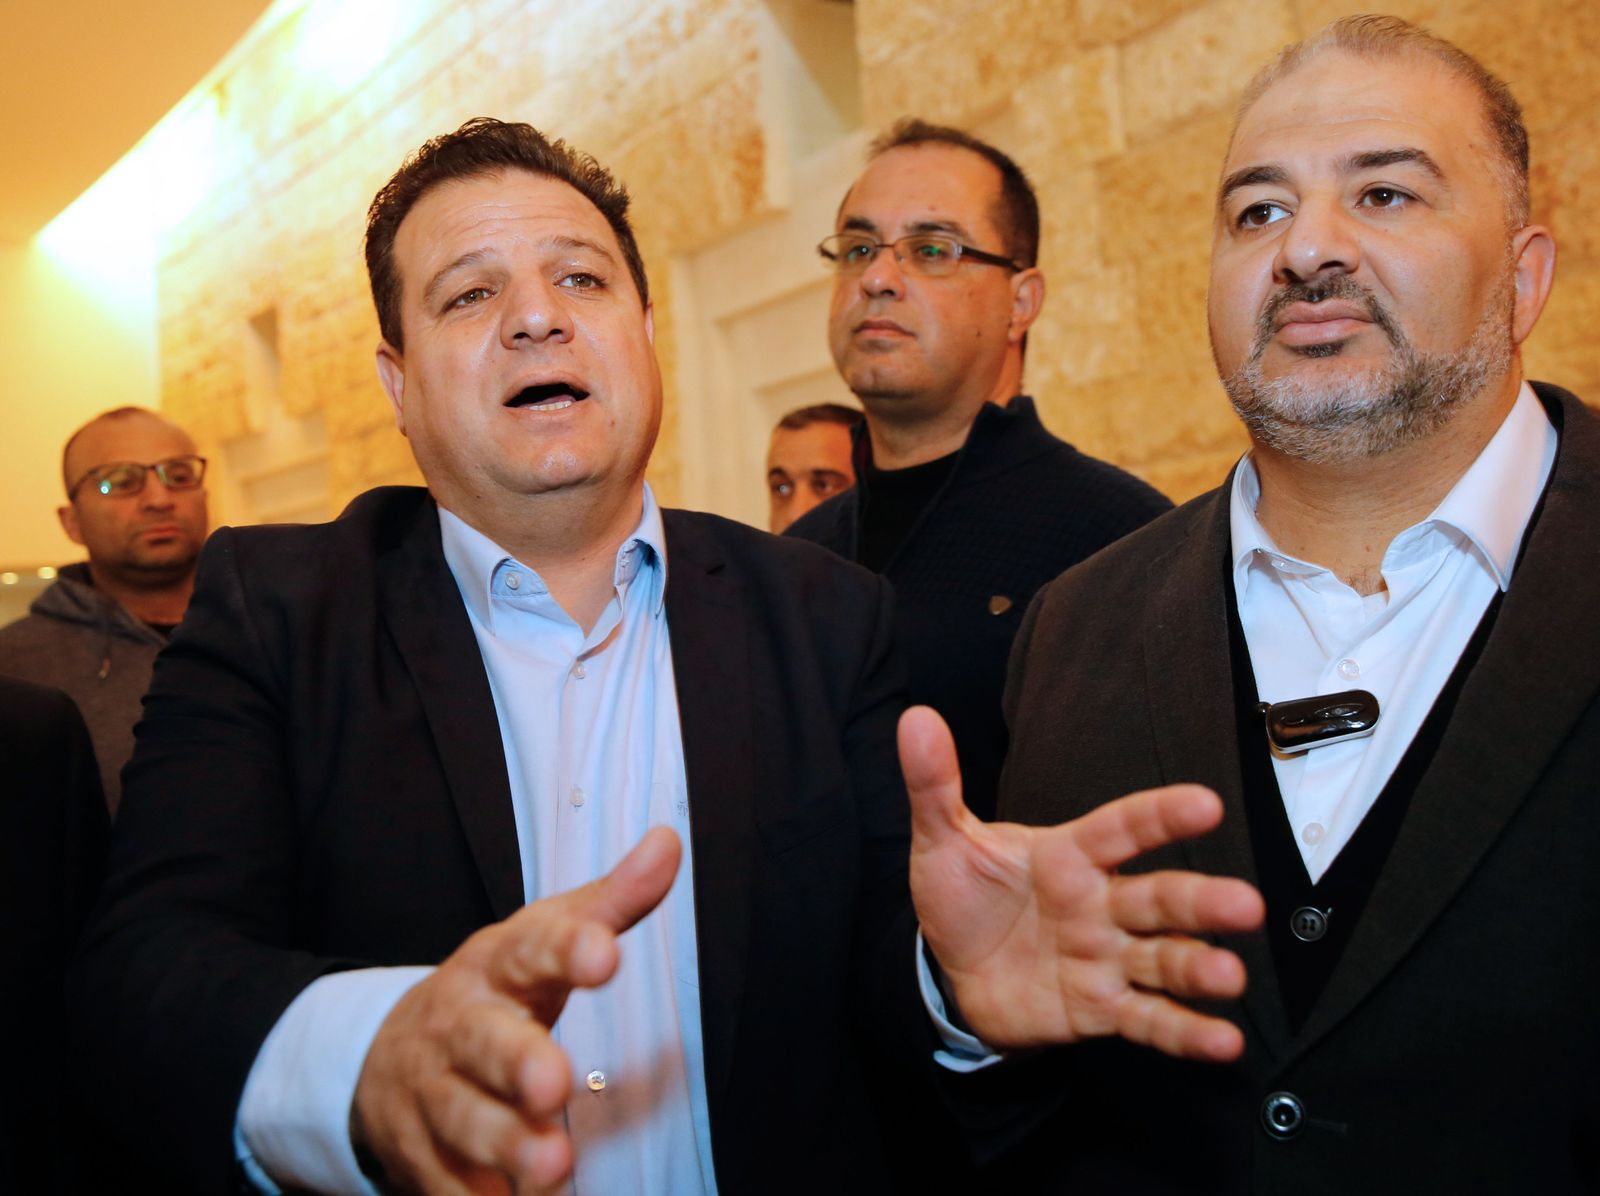 ISRAEL-POLITICS-VOTE-ARABS Ayman Odeh